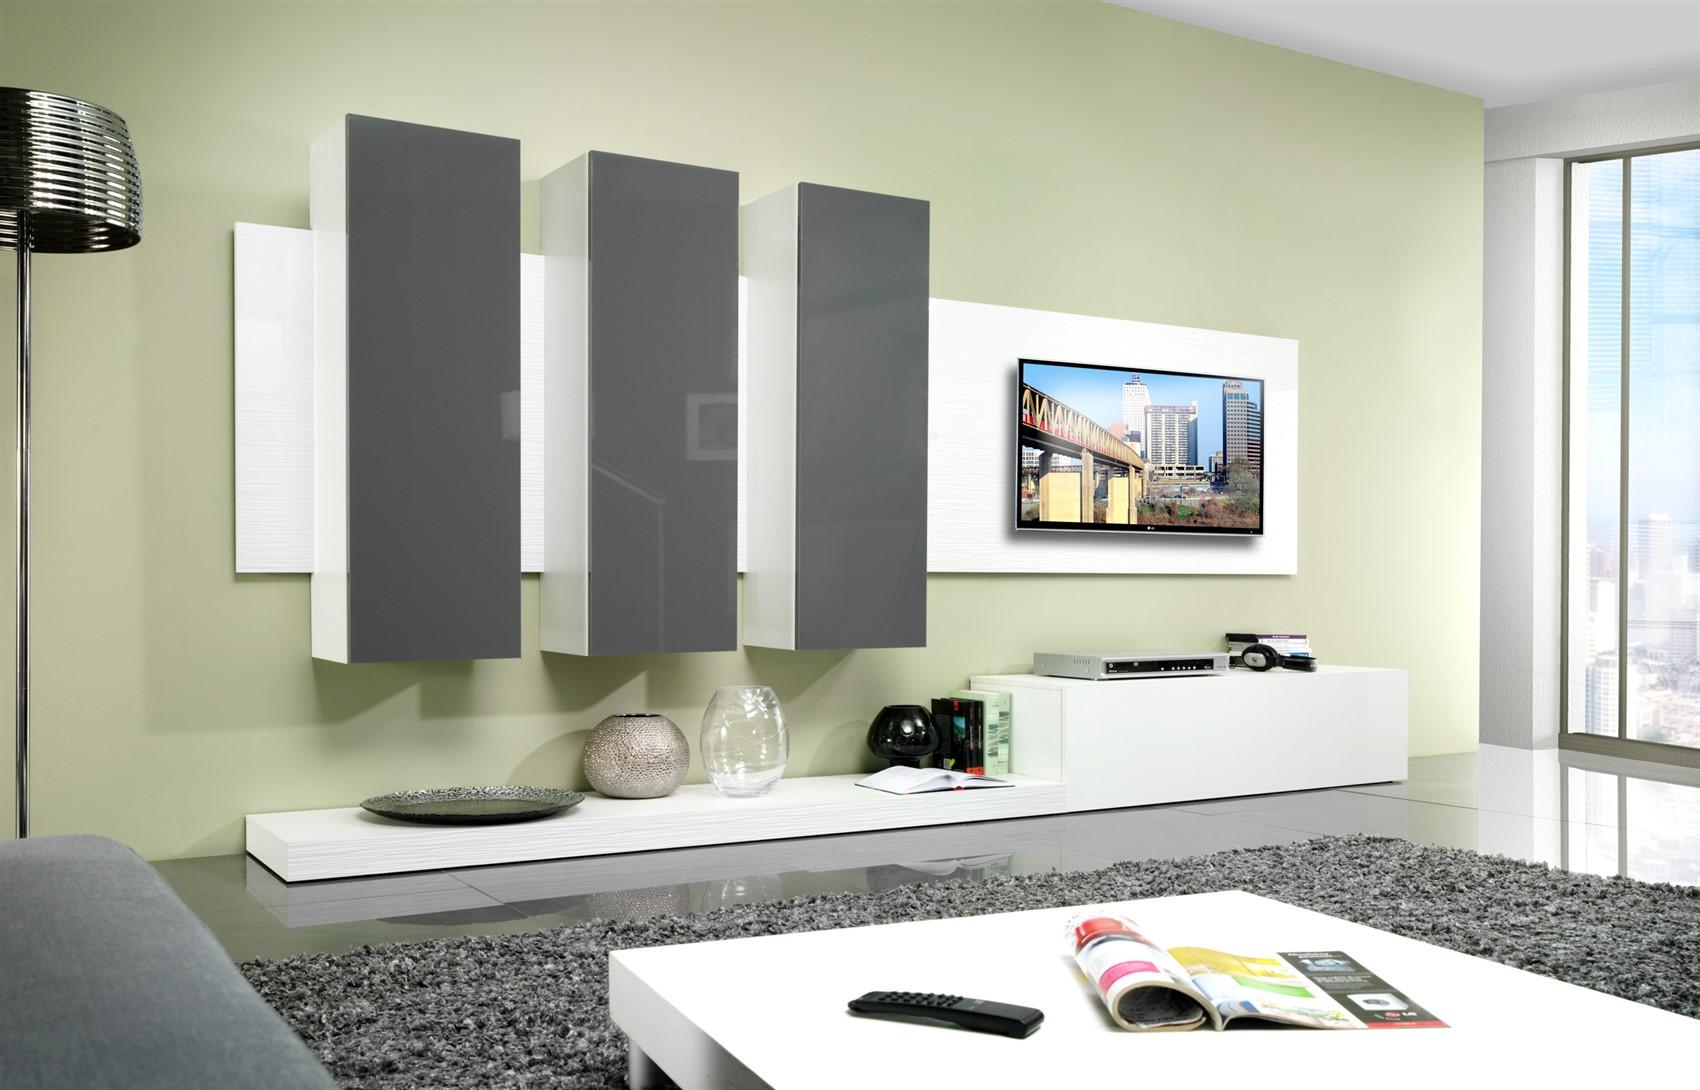 mediawand wohnwand city hochglanz weiss grau fun m bel. Black Bedroom Furniture Sets. Home Design Ideas